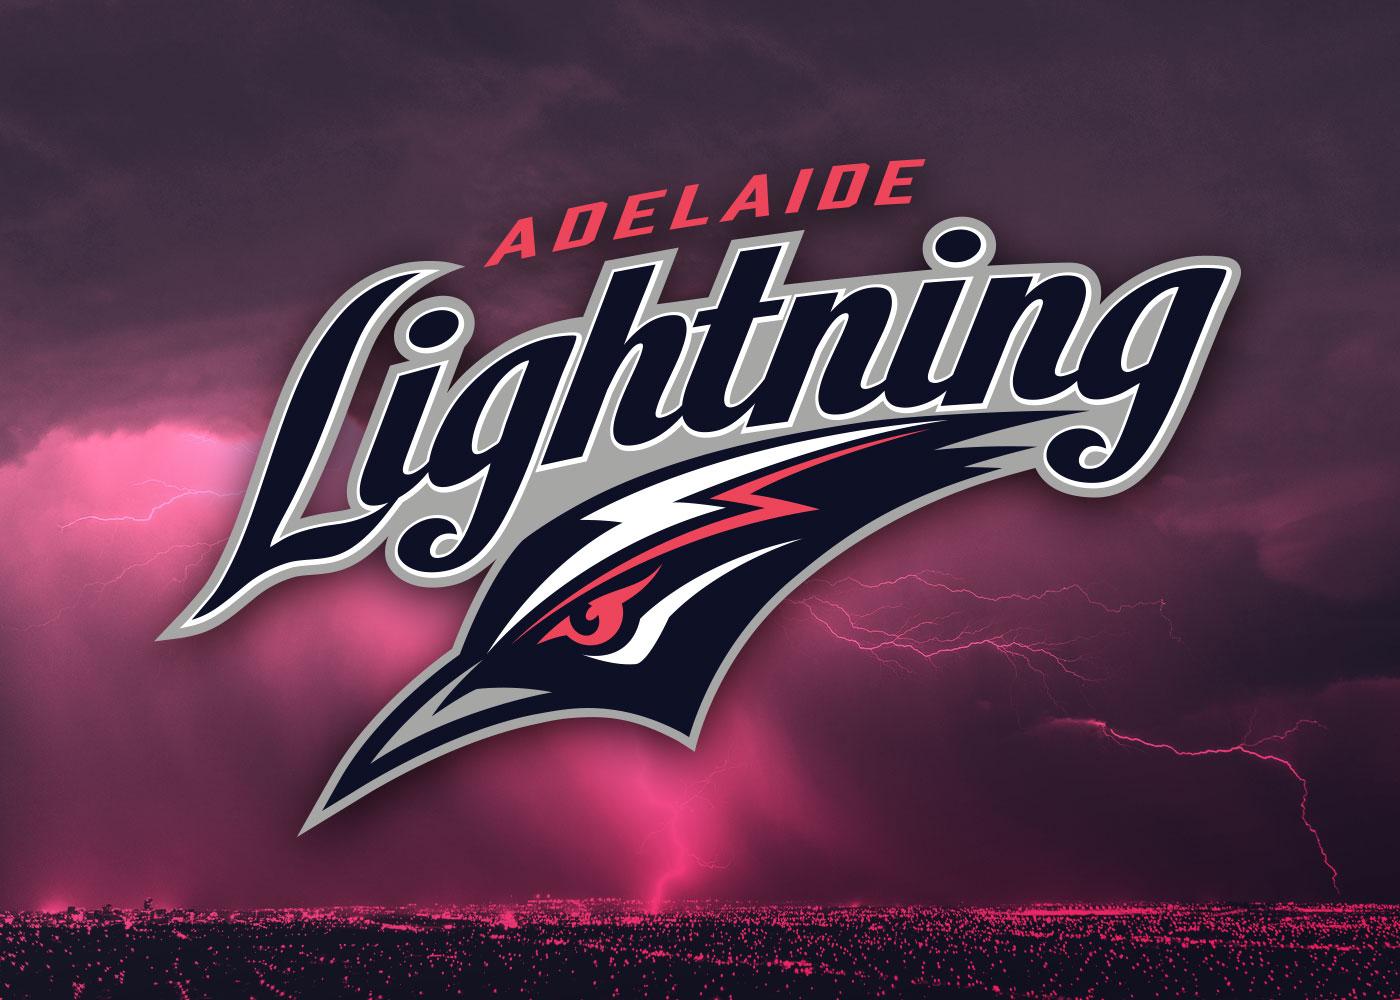 ADELAIDE-LIGHTNING_WebPage_01